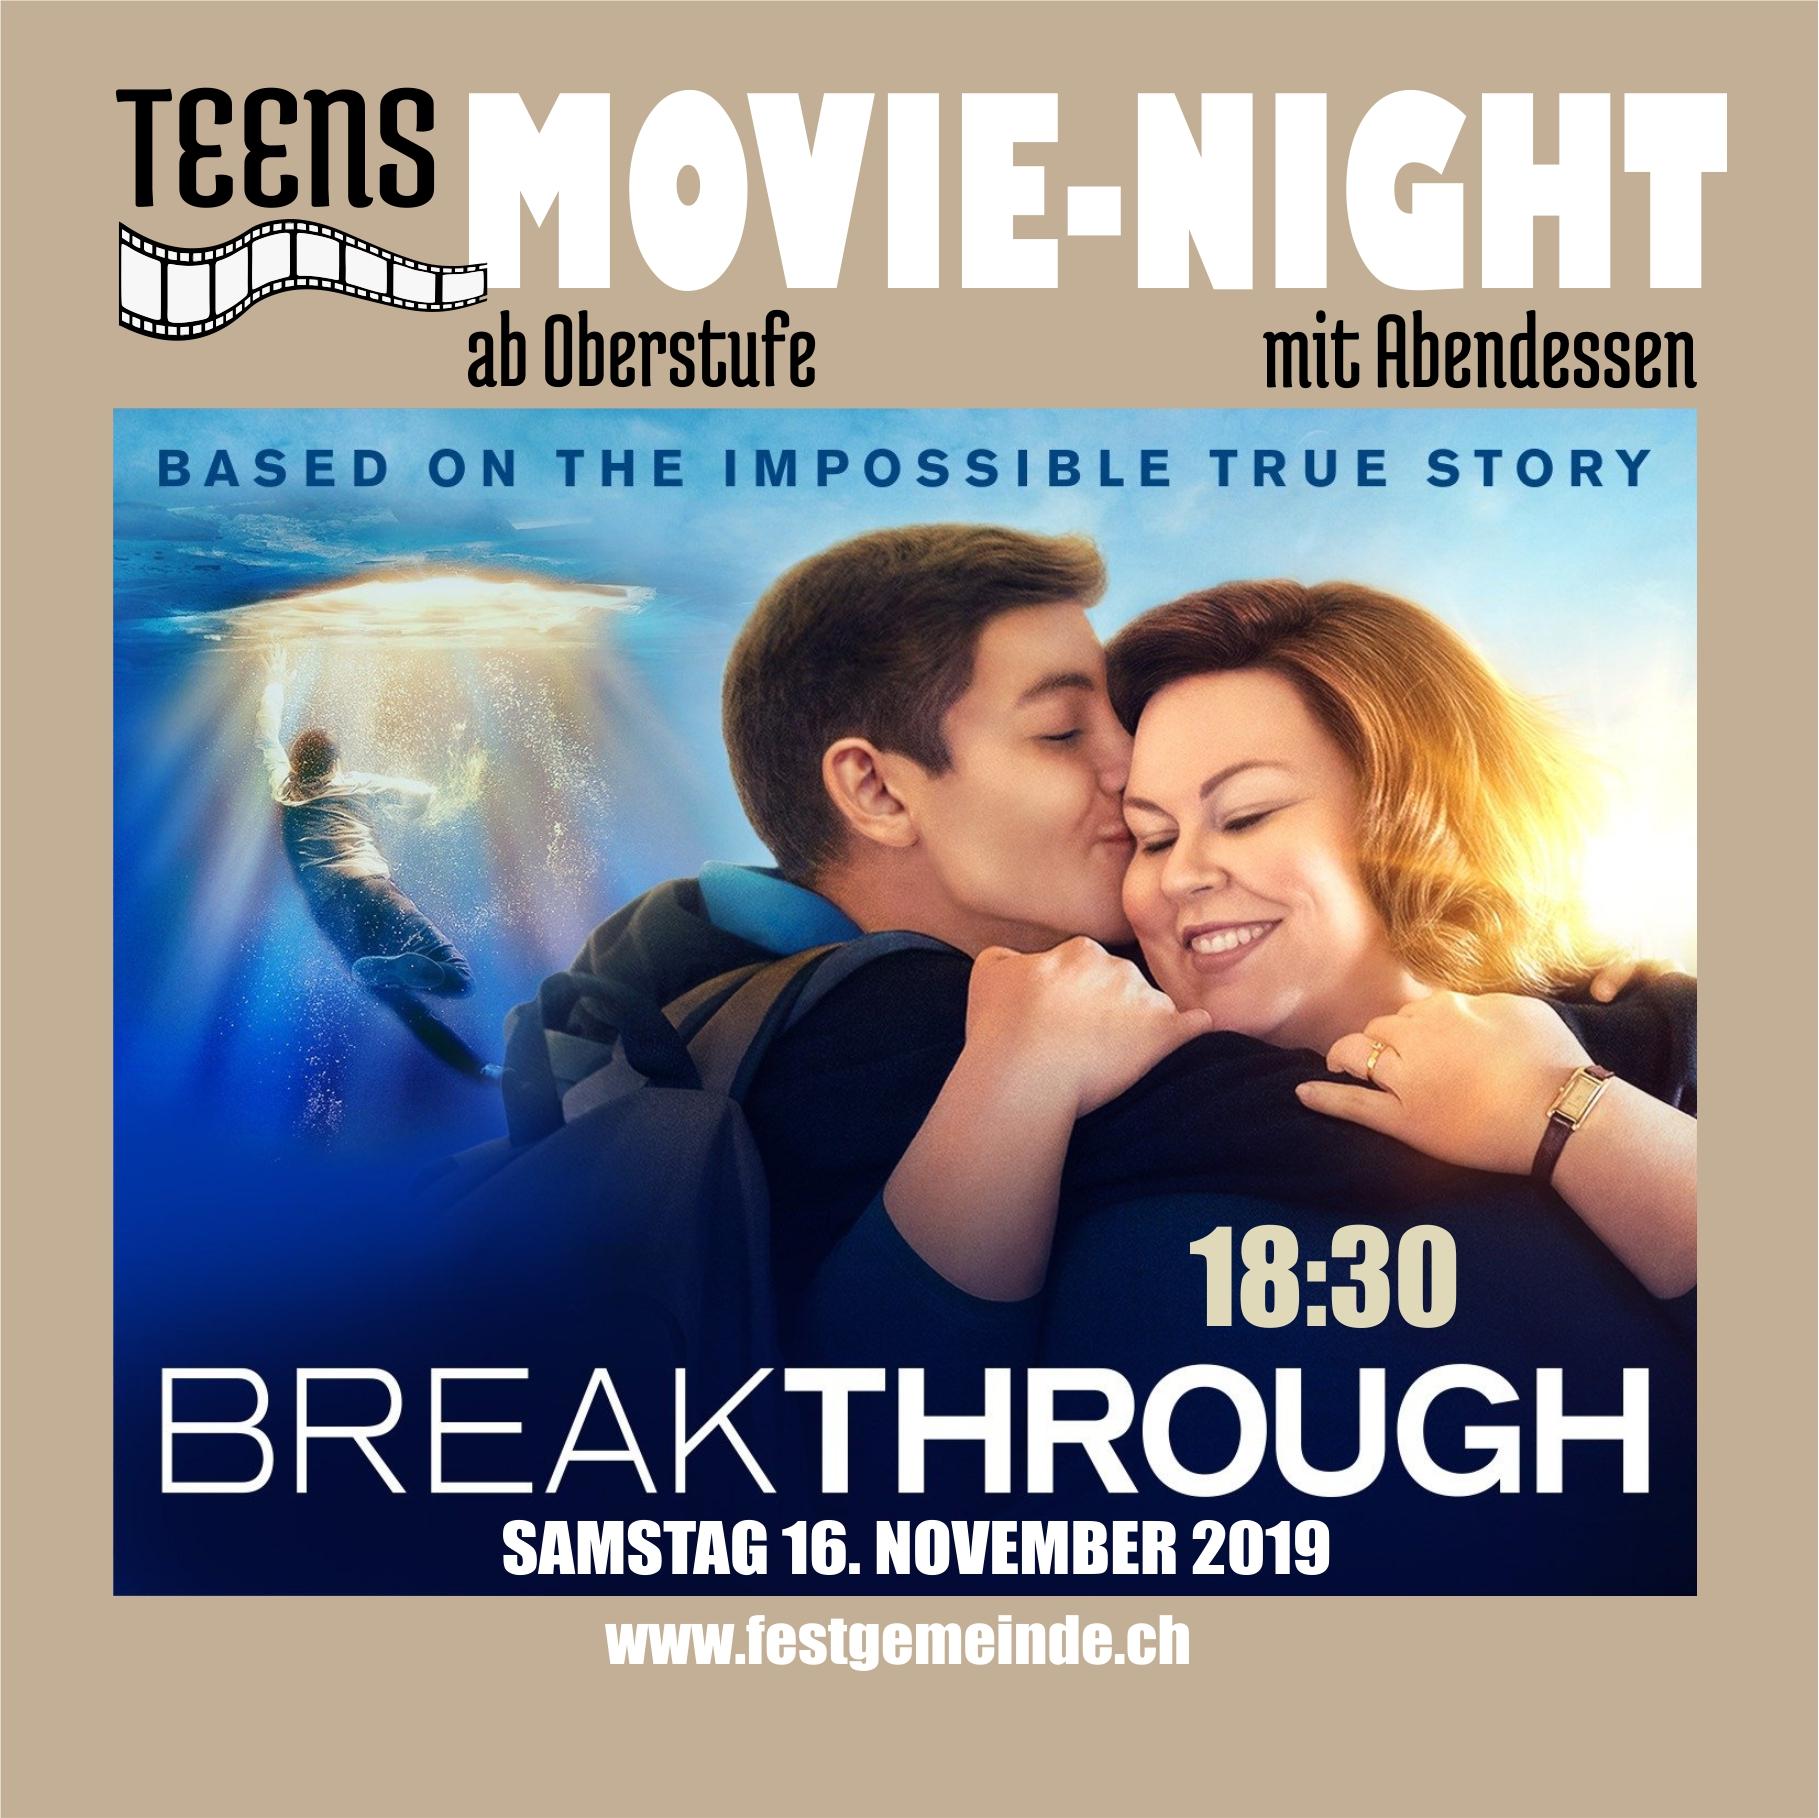 Teens Movie Night